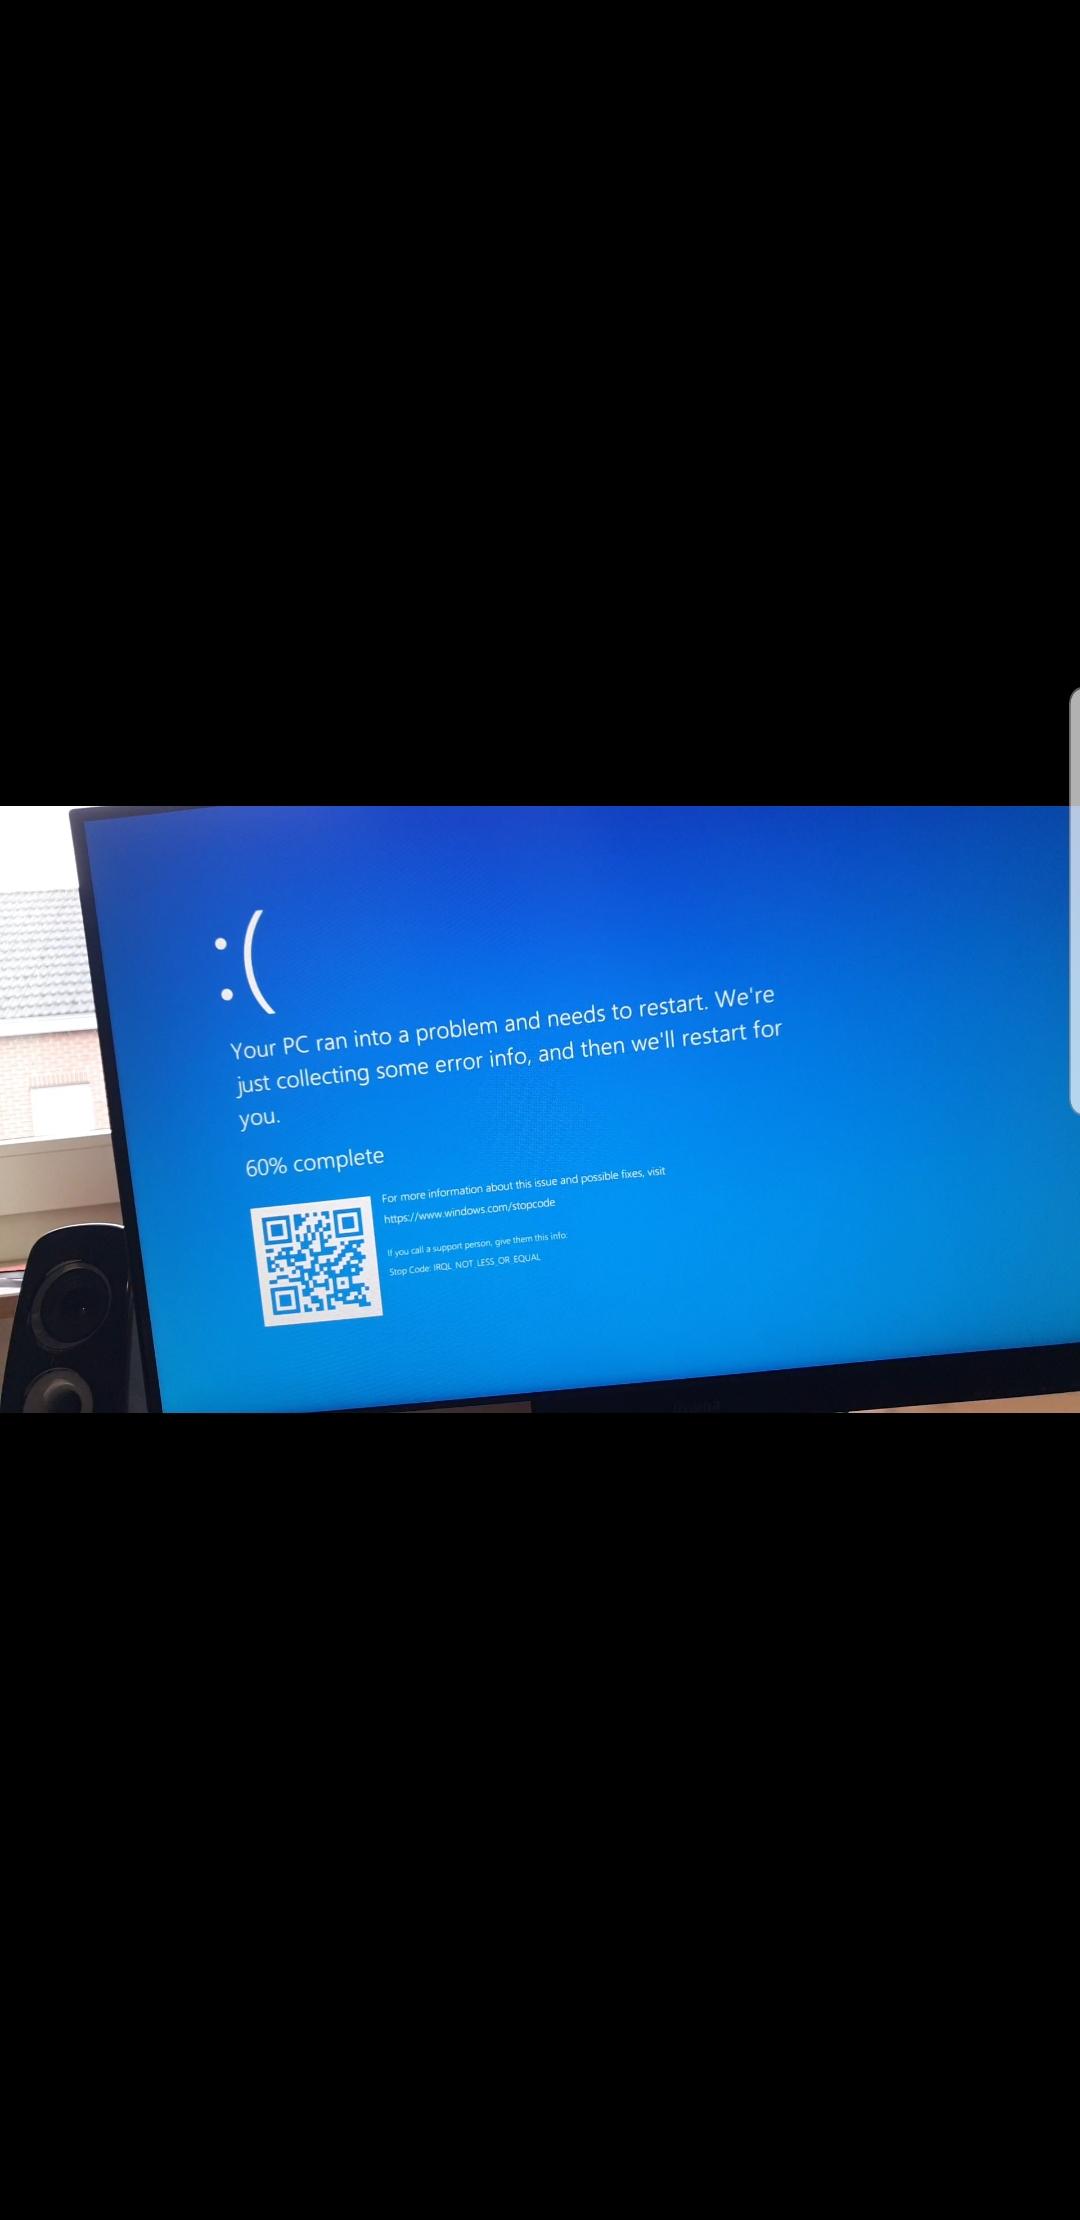 Screenshot_20191017-120743_Video Player.jpg